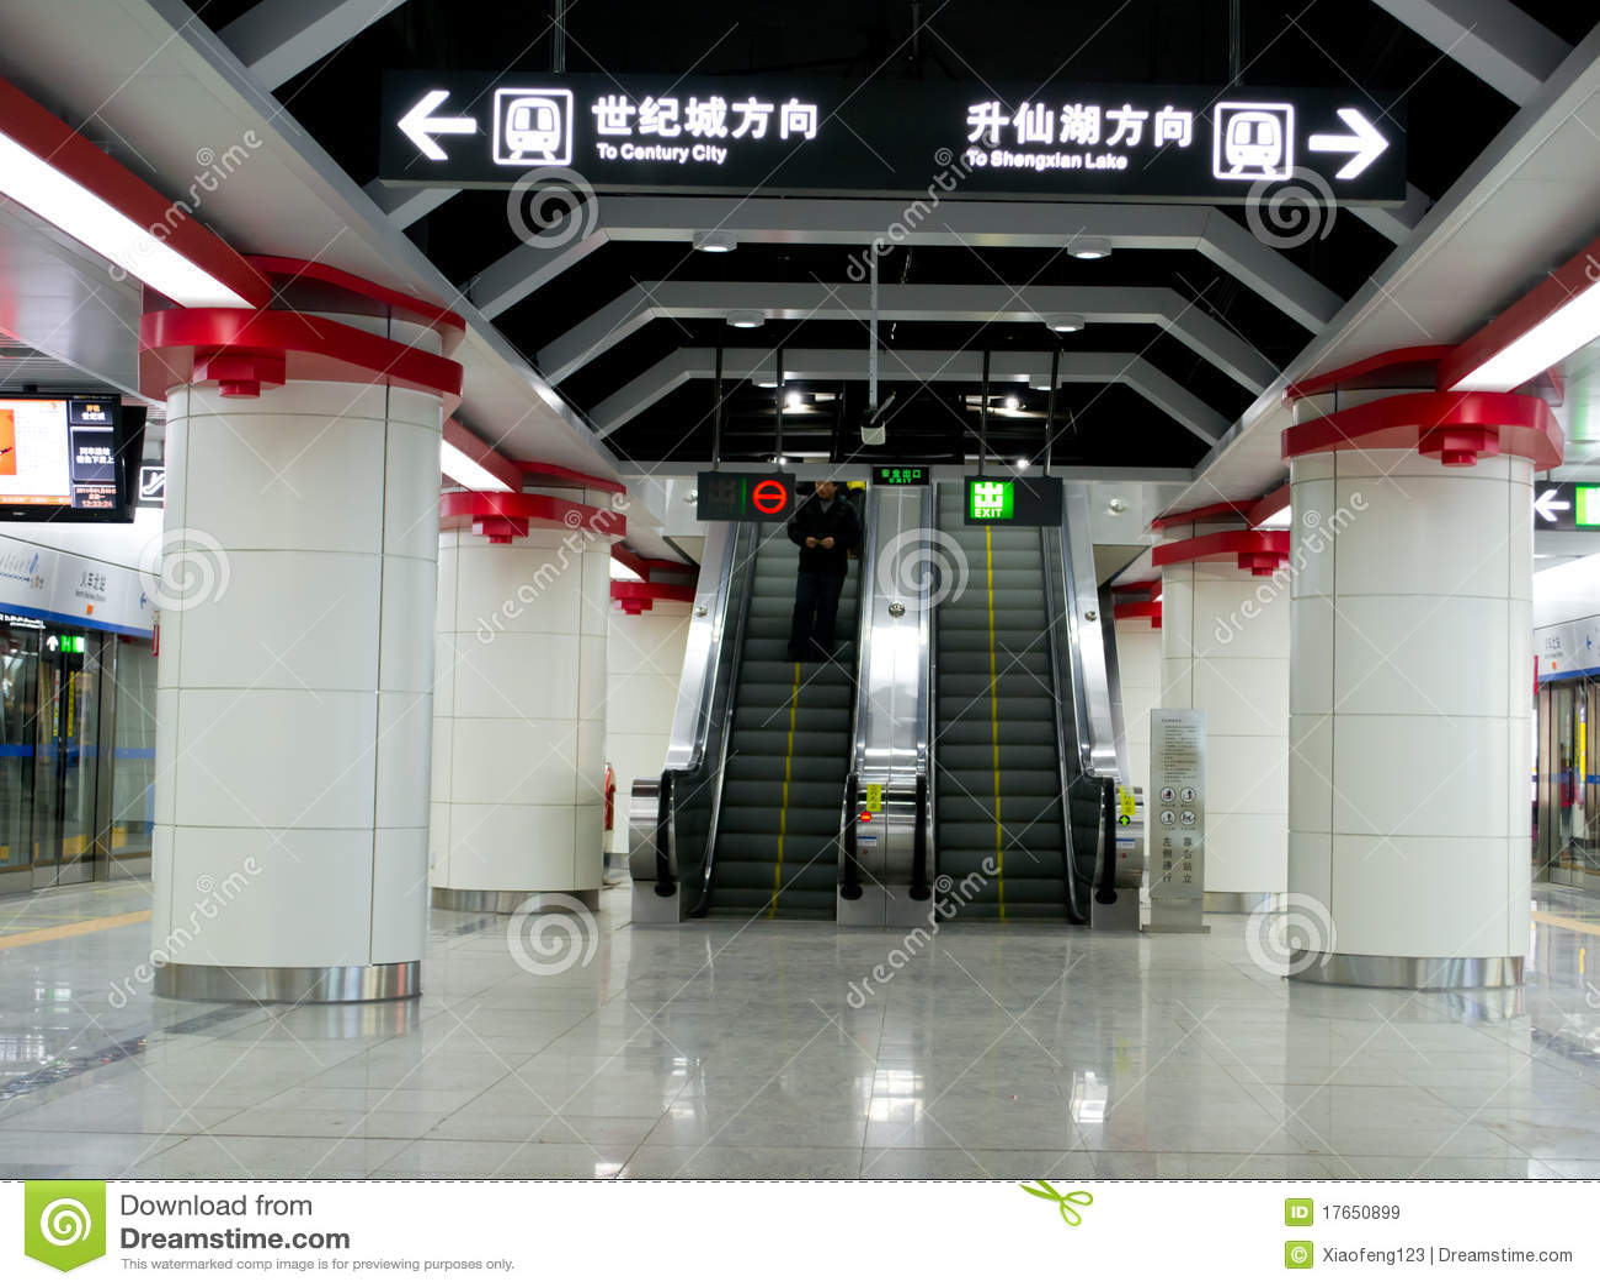 Metro aisle